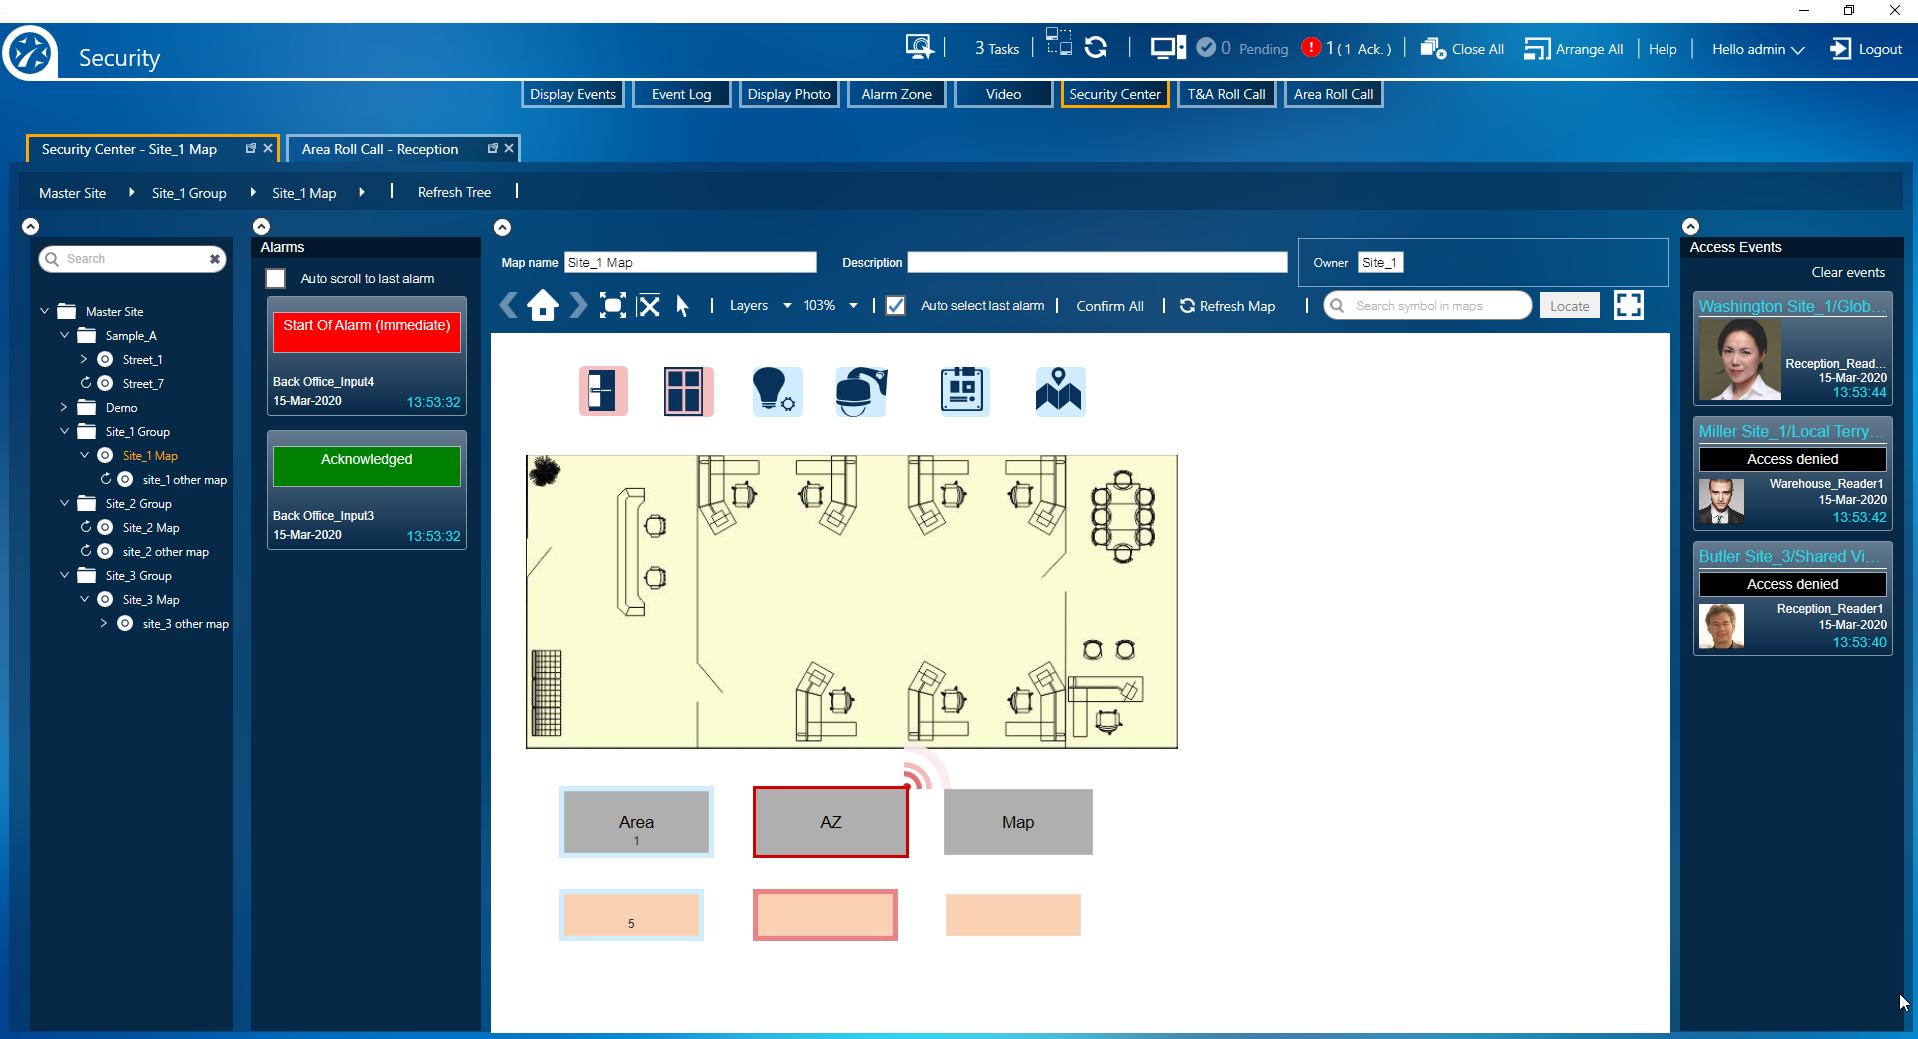 Multisite screenshot